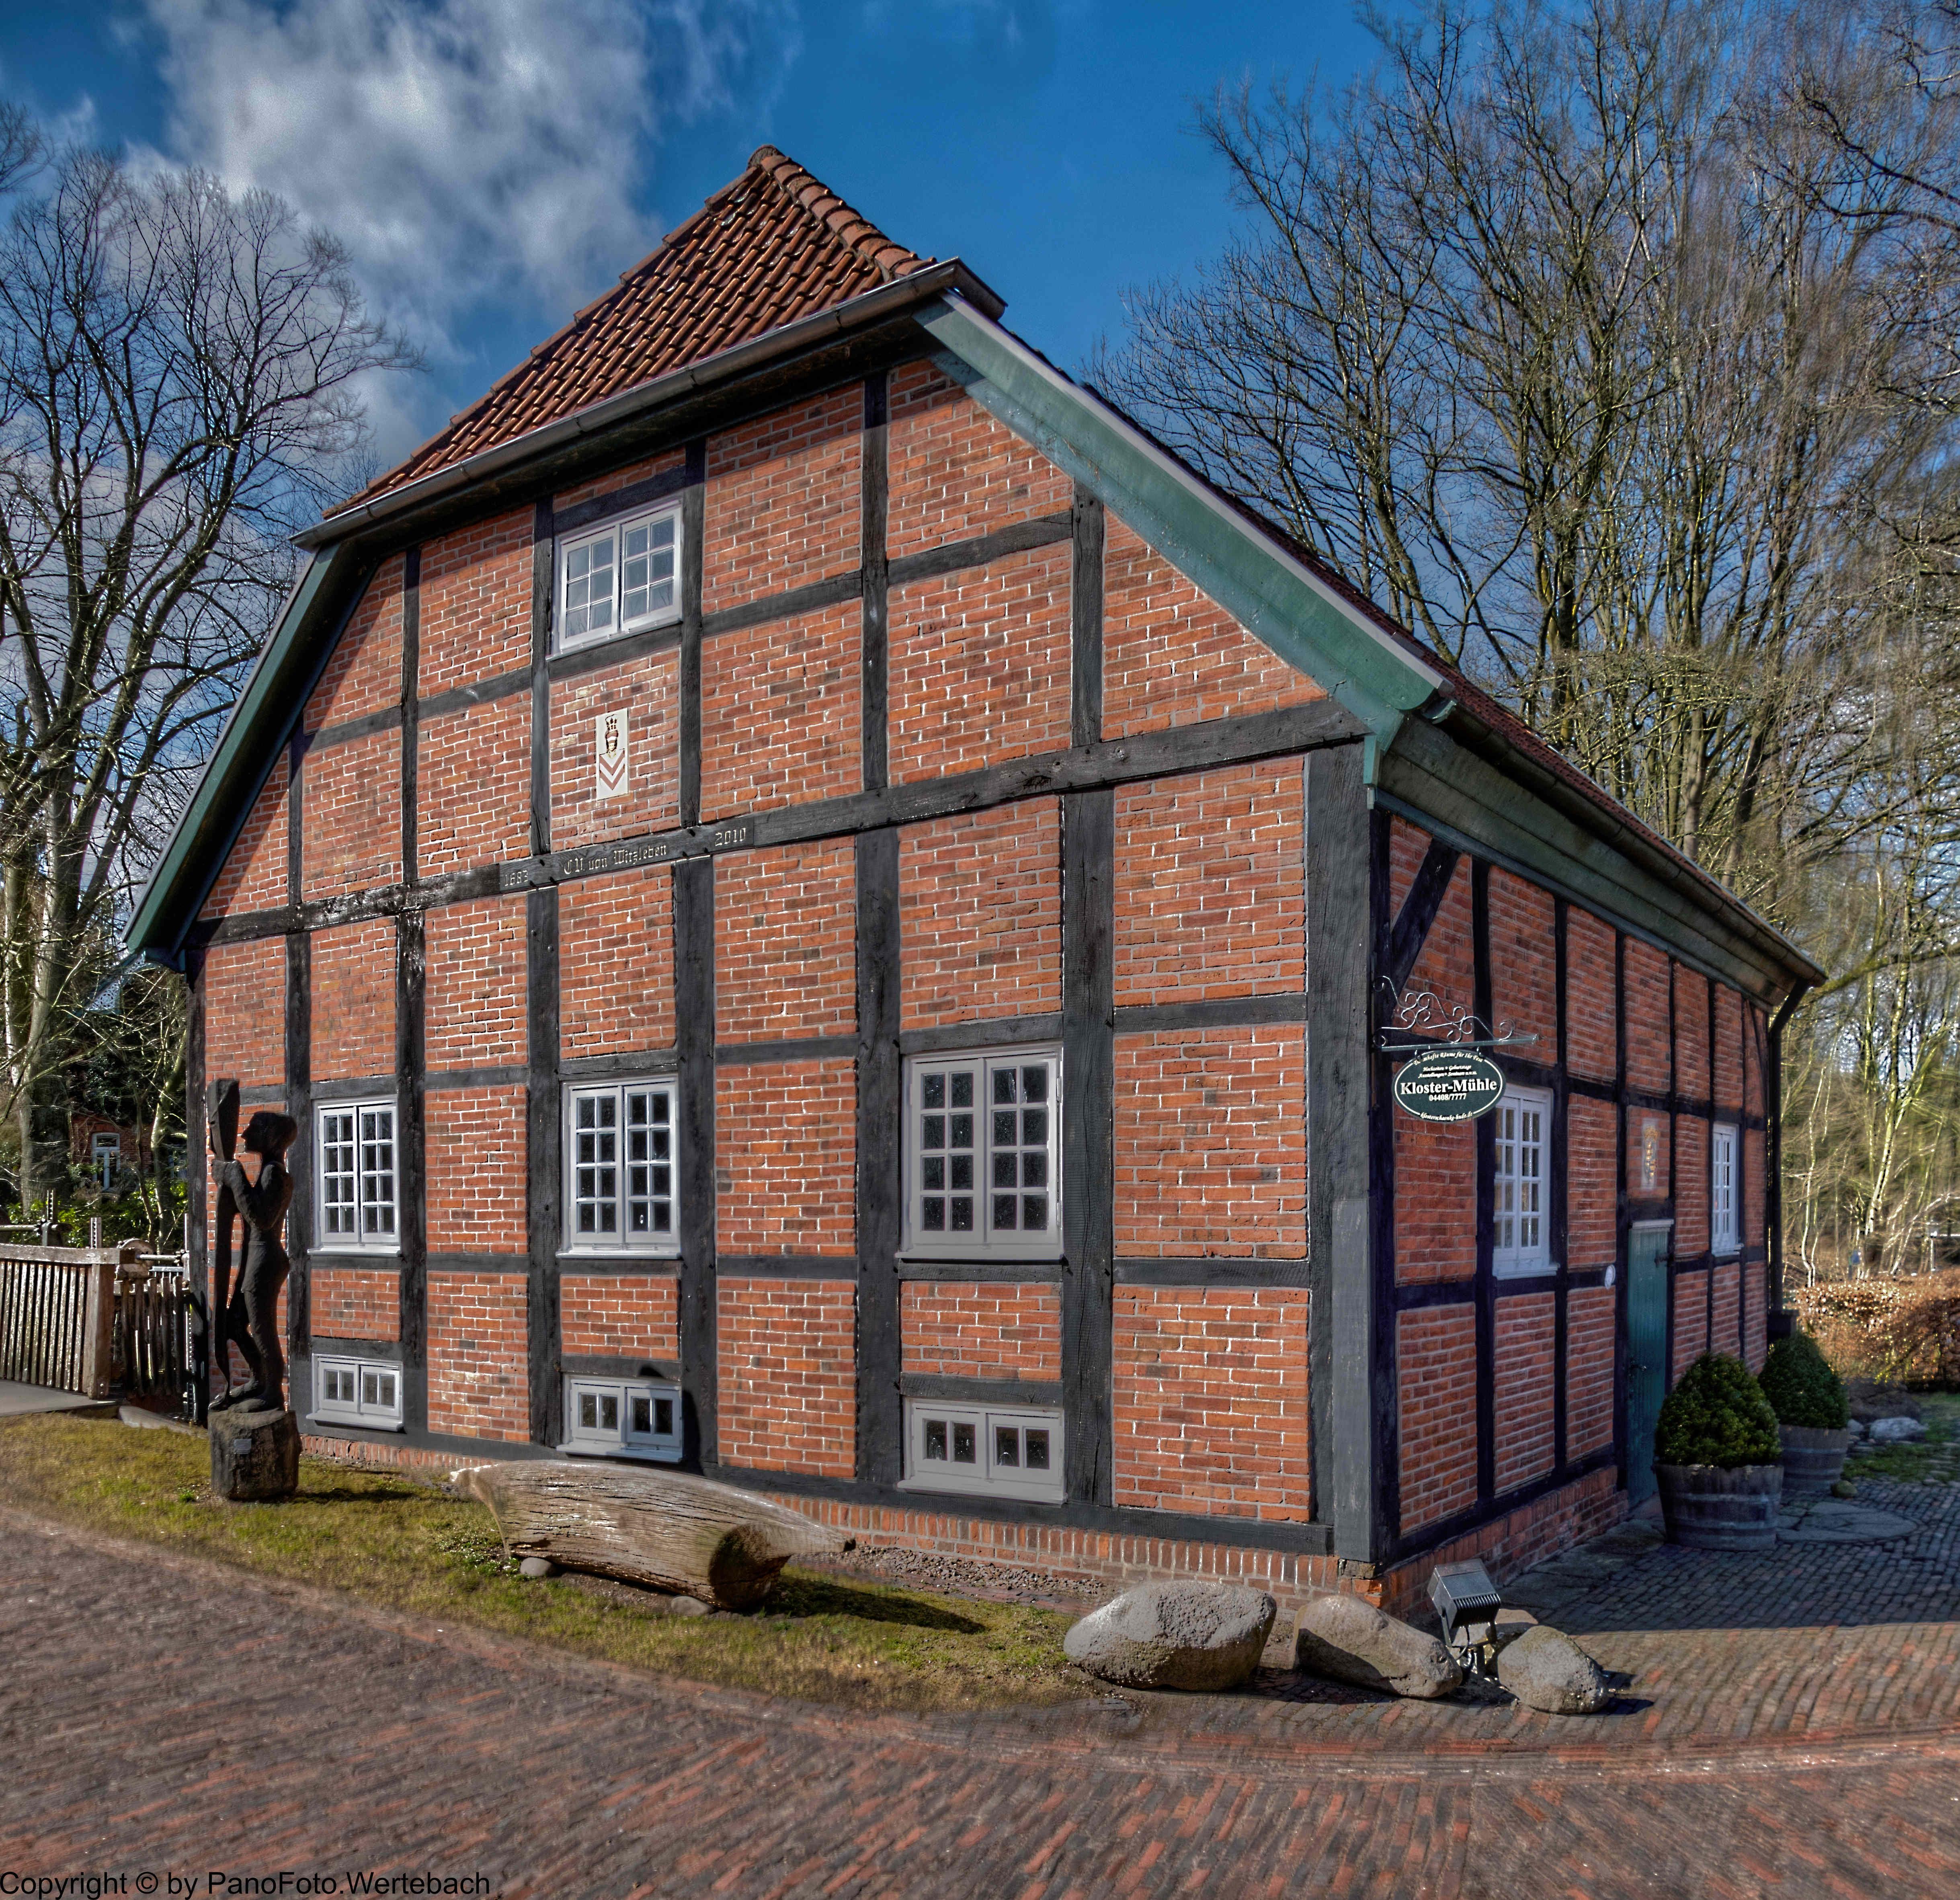 www.pano-createur.de - NI097 Klostermühle in Hude